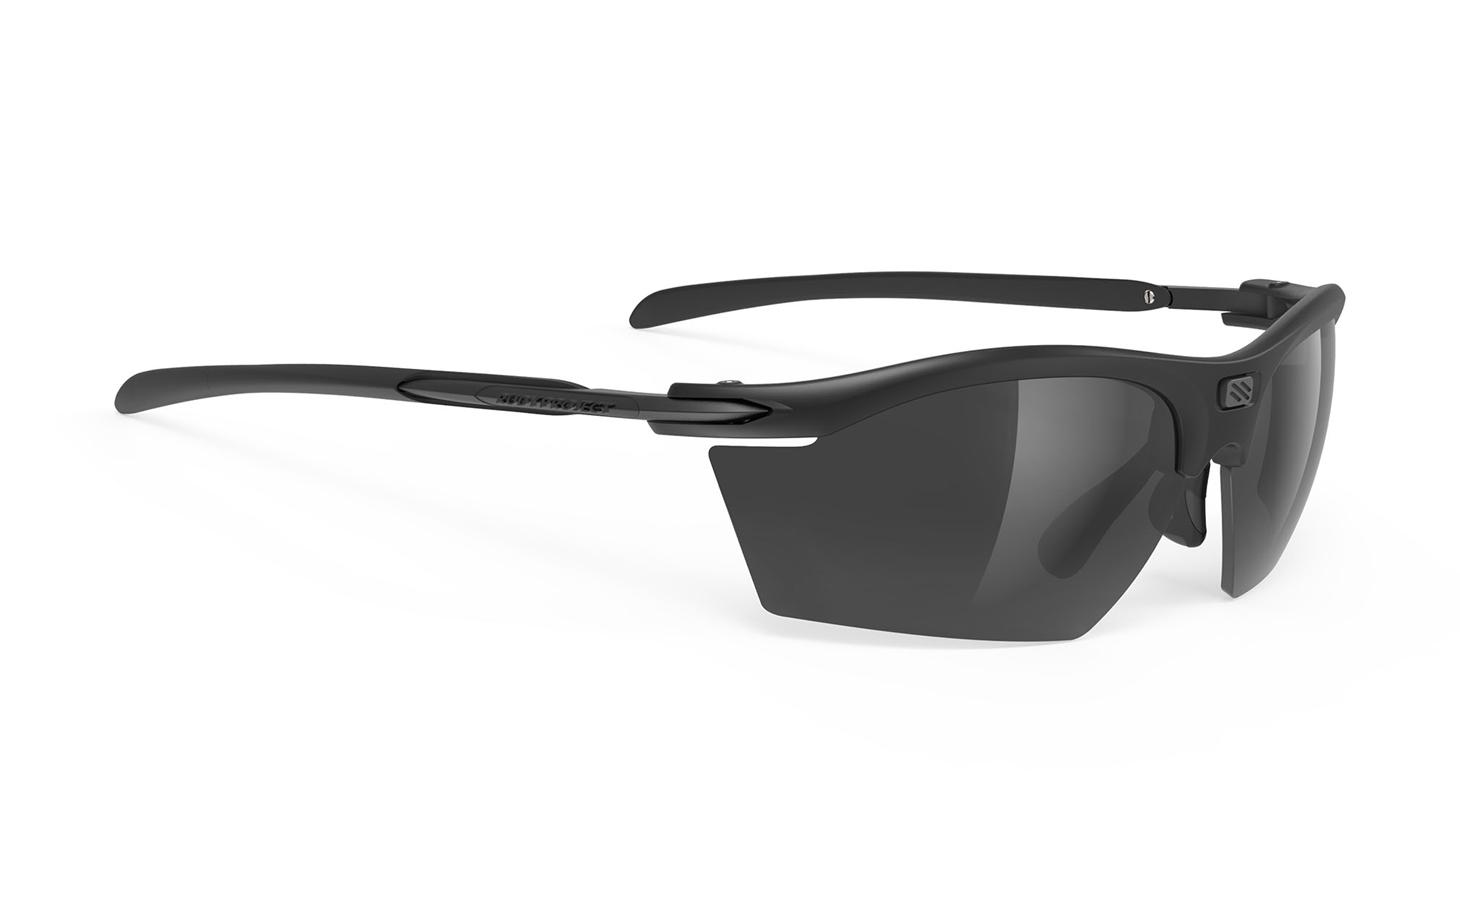 b813e675c3b Glasses and sports helmets - Rudy Project